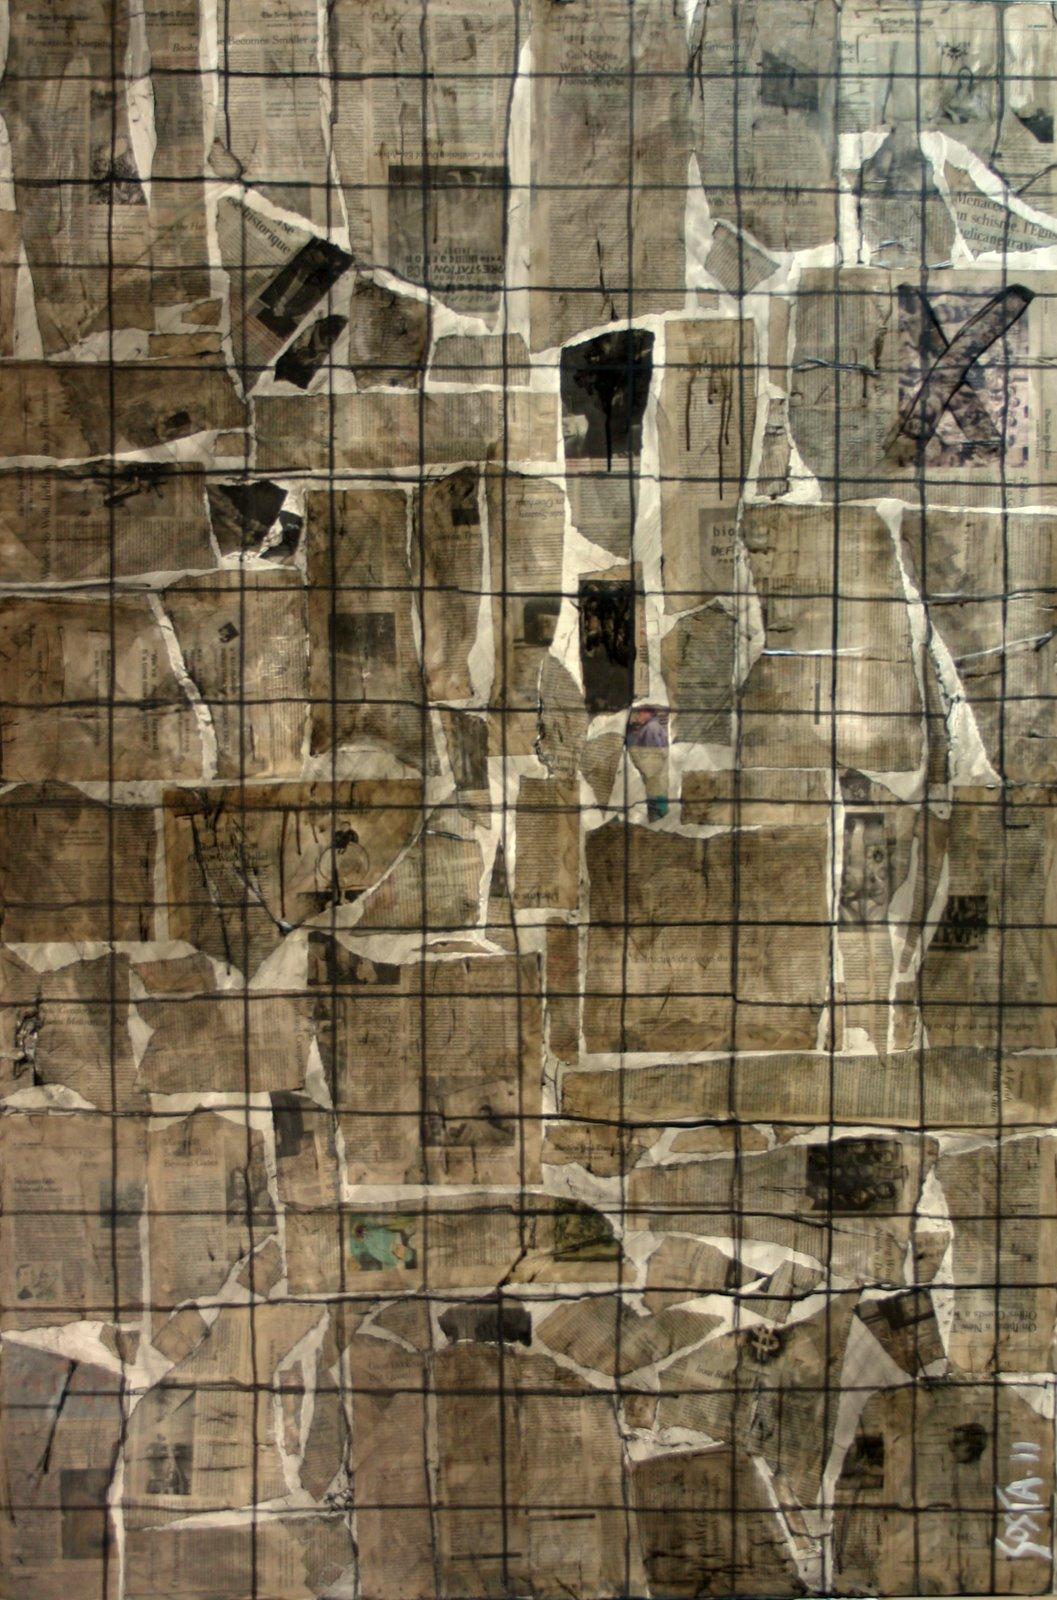 journaux, collage Tableau Contemporain, Breaking News. Sophie Costa, artiste peintre.